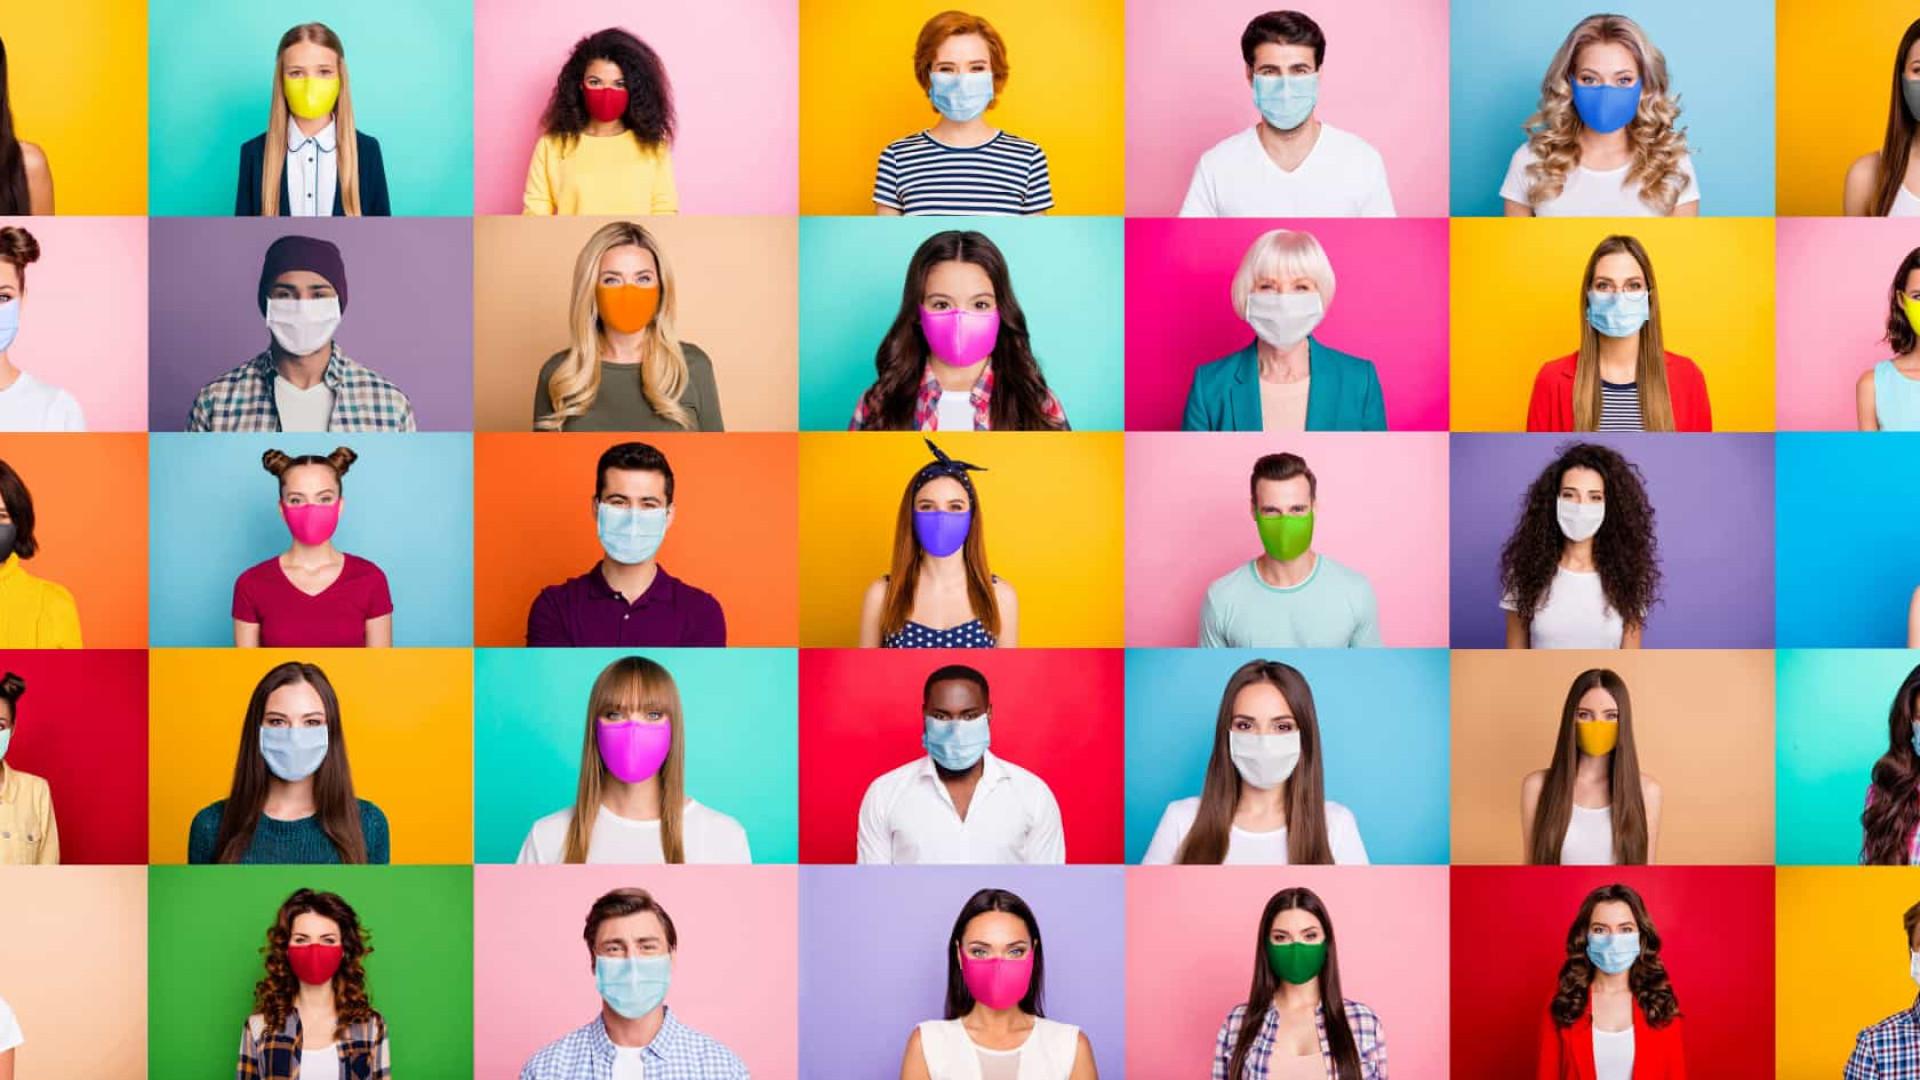 Um novo acessório da moda: as máscaras contra a Covid-19